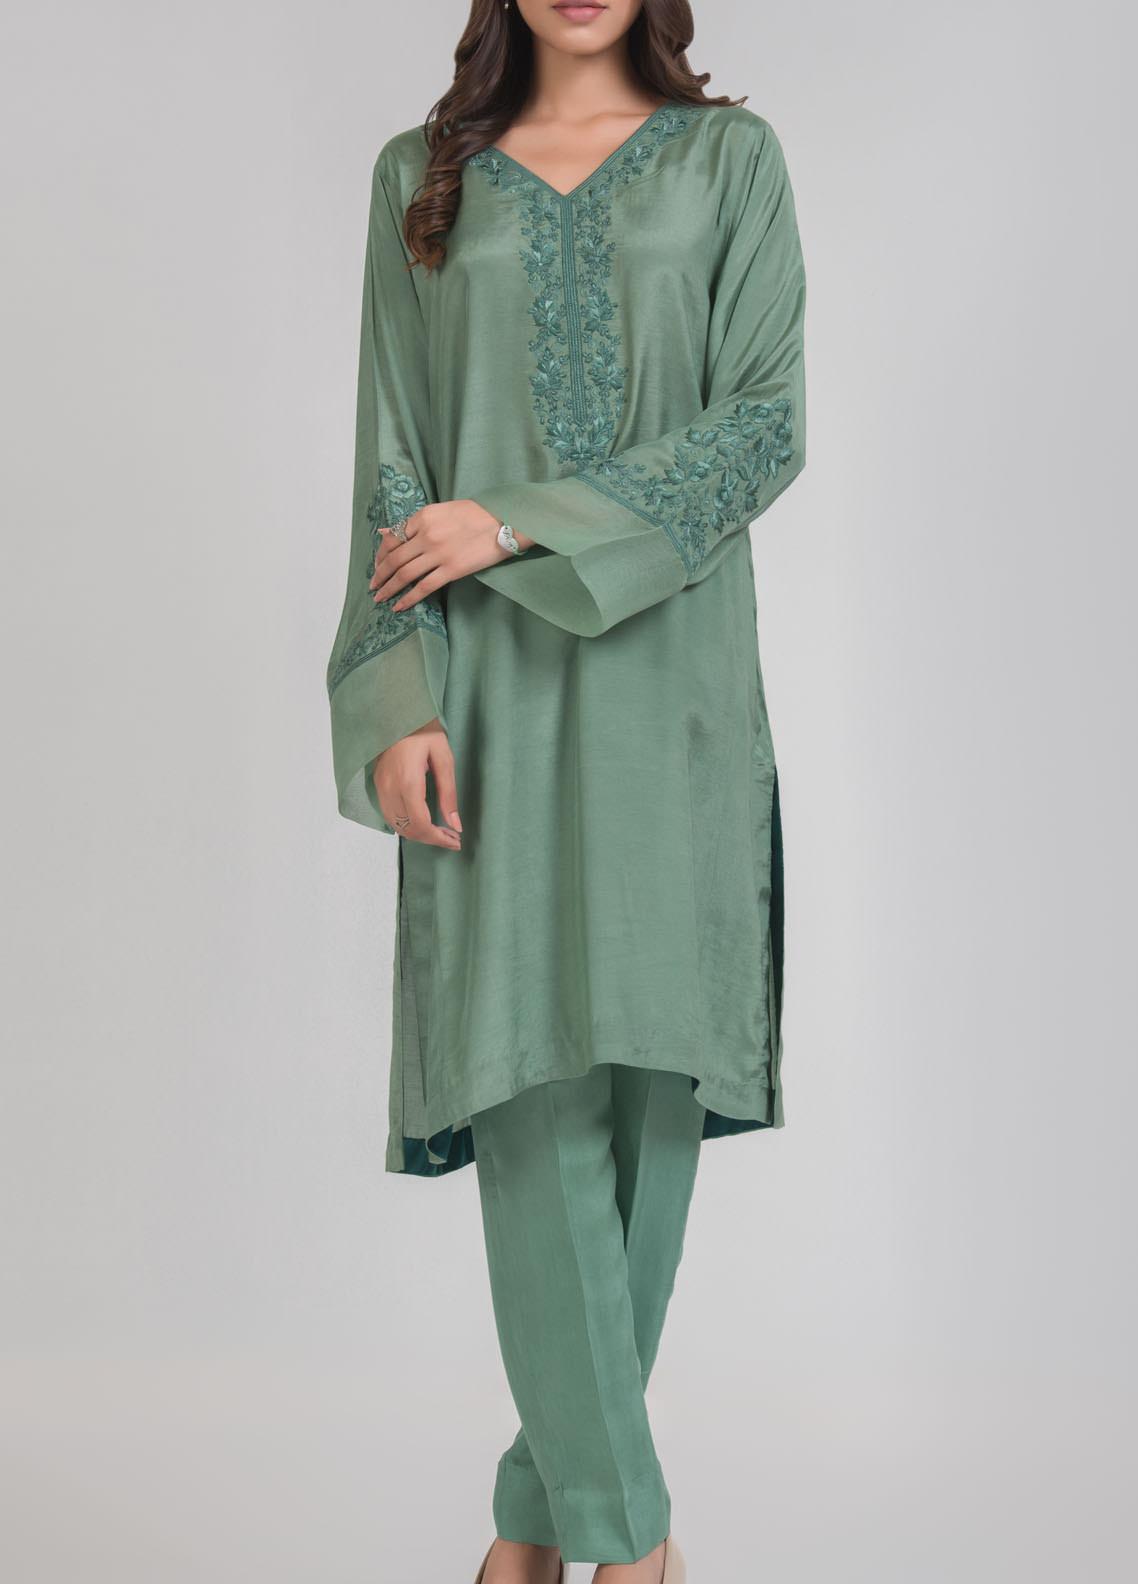 Kuli Jume Embroidered Silk Stitched 2 Piece Suit ishq-e-Aqeedah